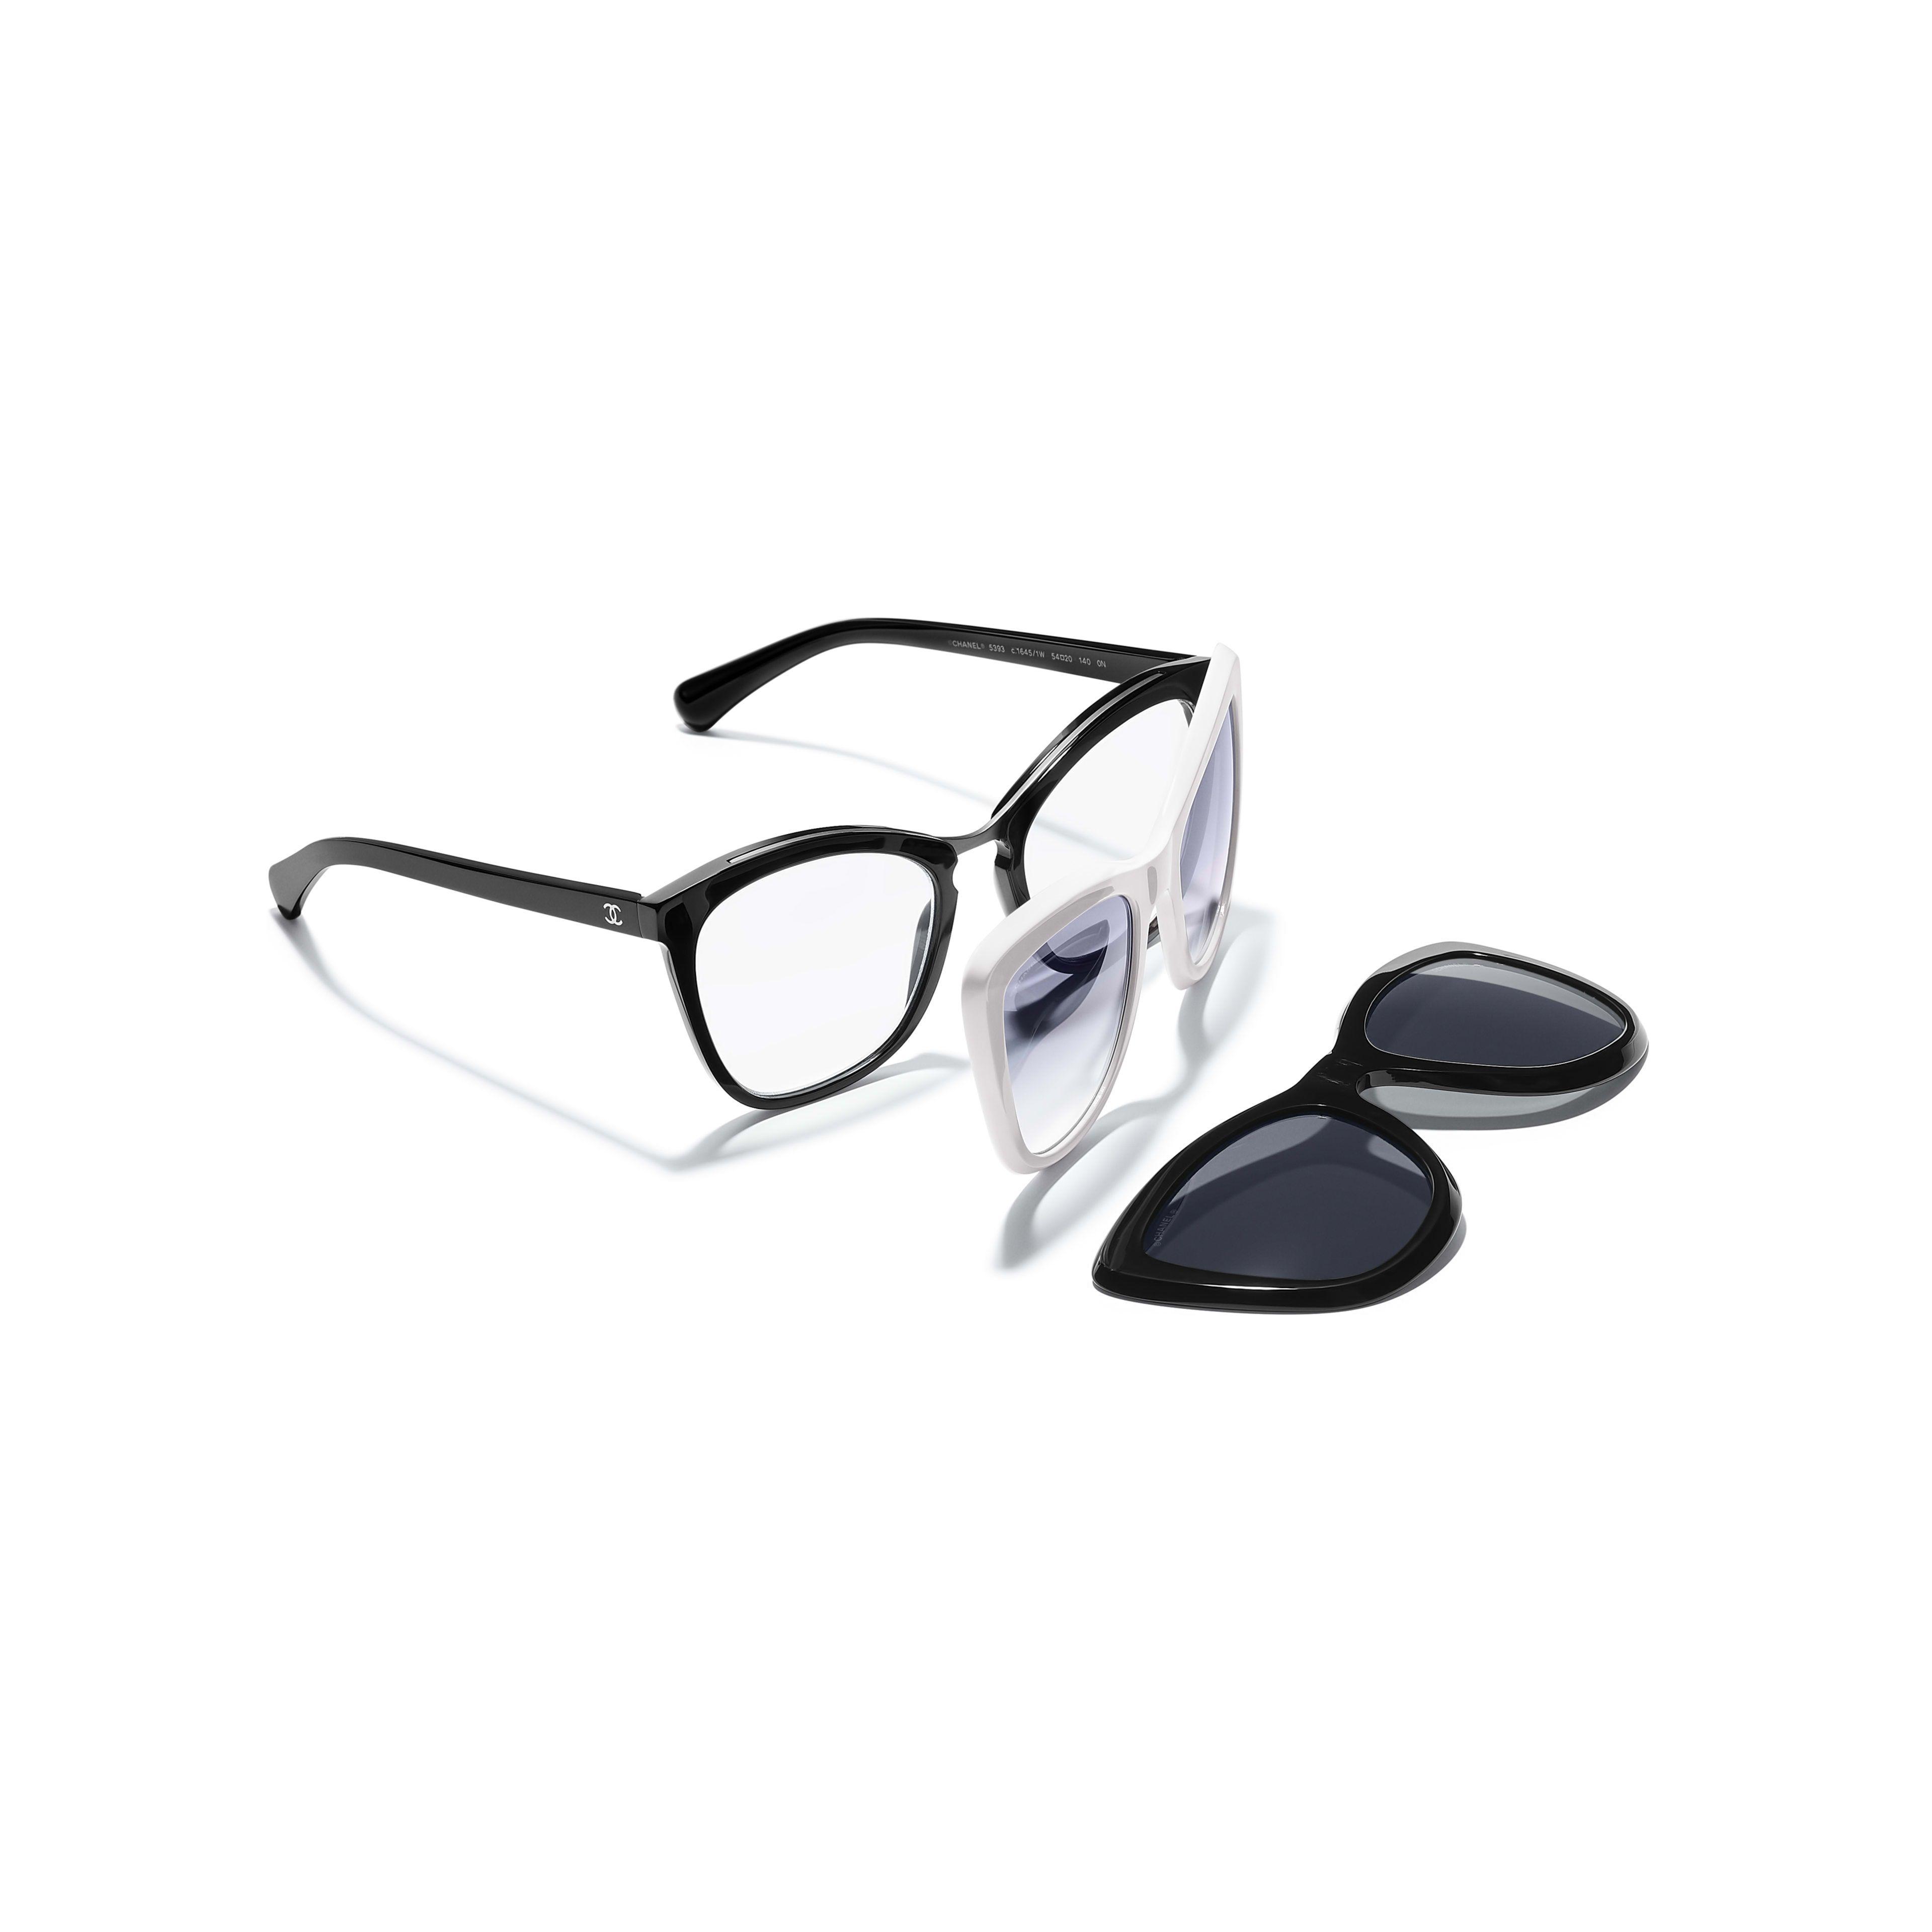 045068fc4b Clip on Sunglasses - Black frame